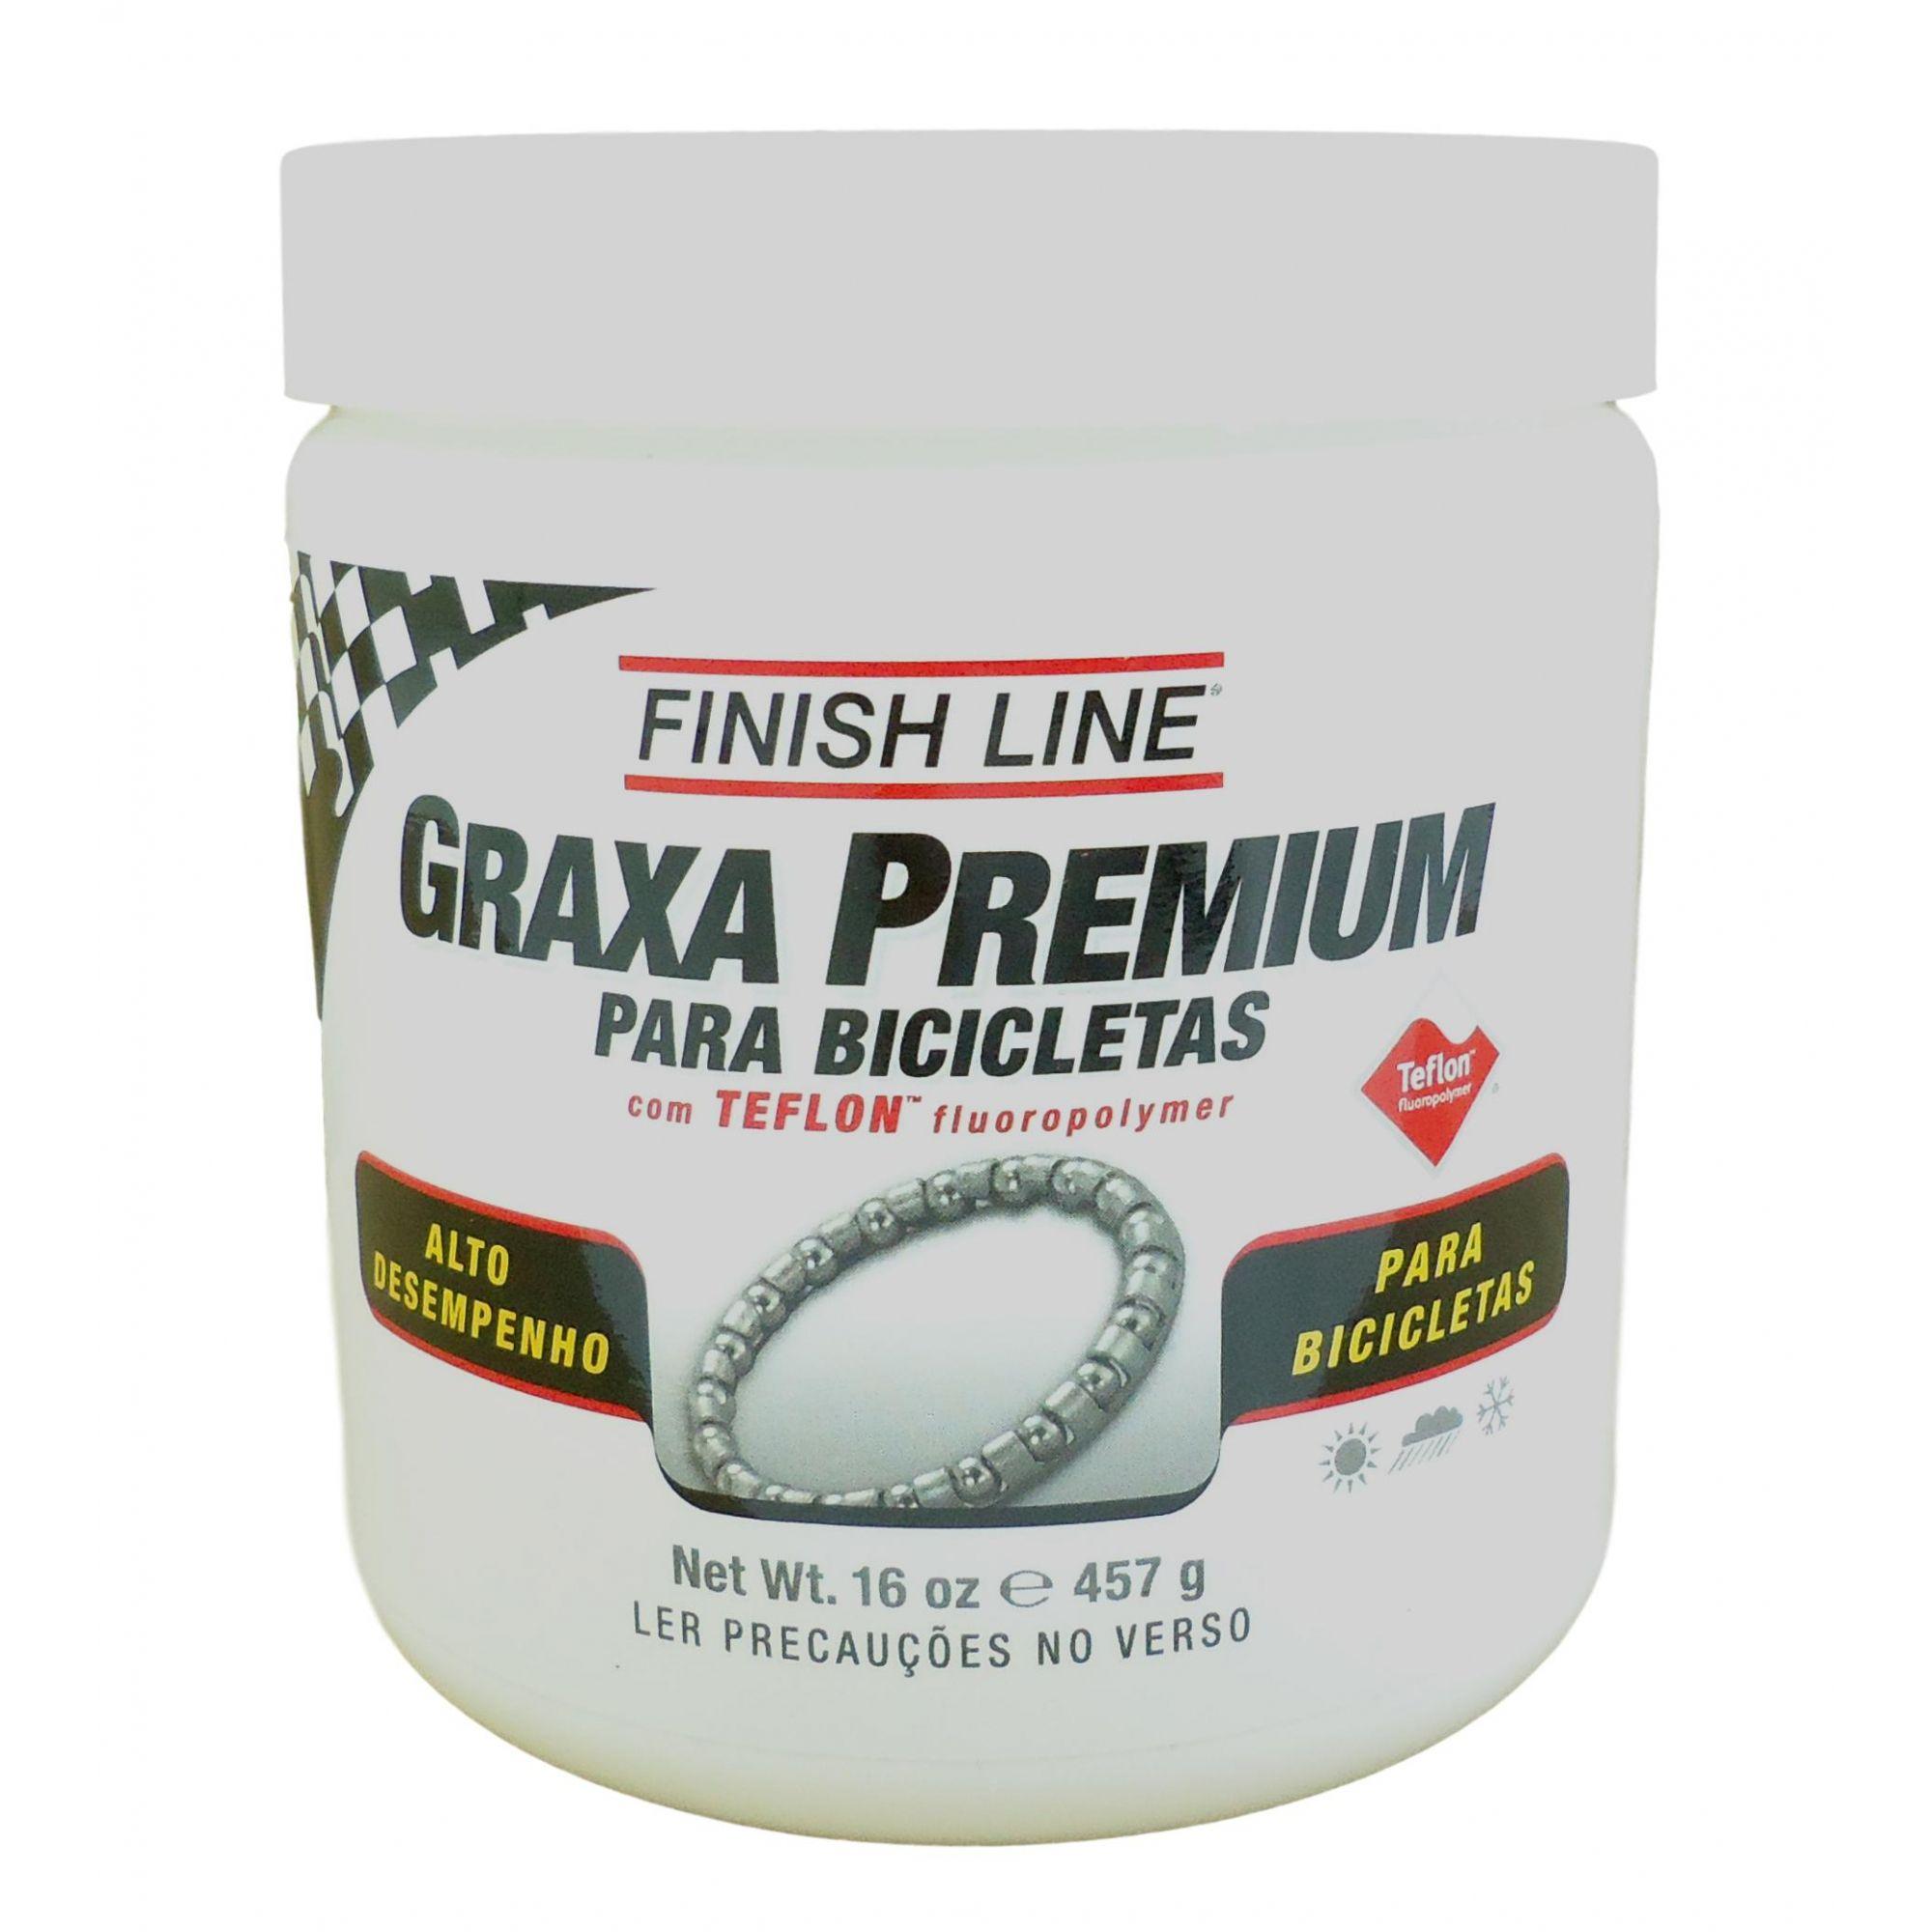 Graxa Branca Finish Line Premium Teflon para Rolamentos Cubos e Partes Bicicletas 457 gramas